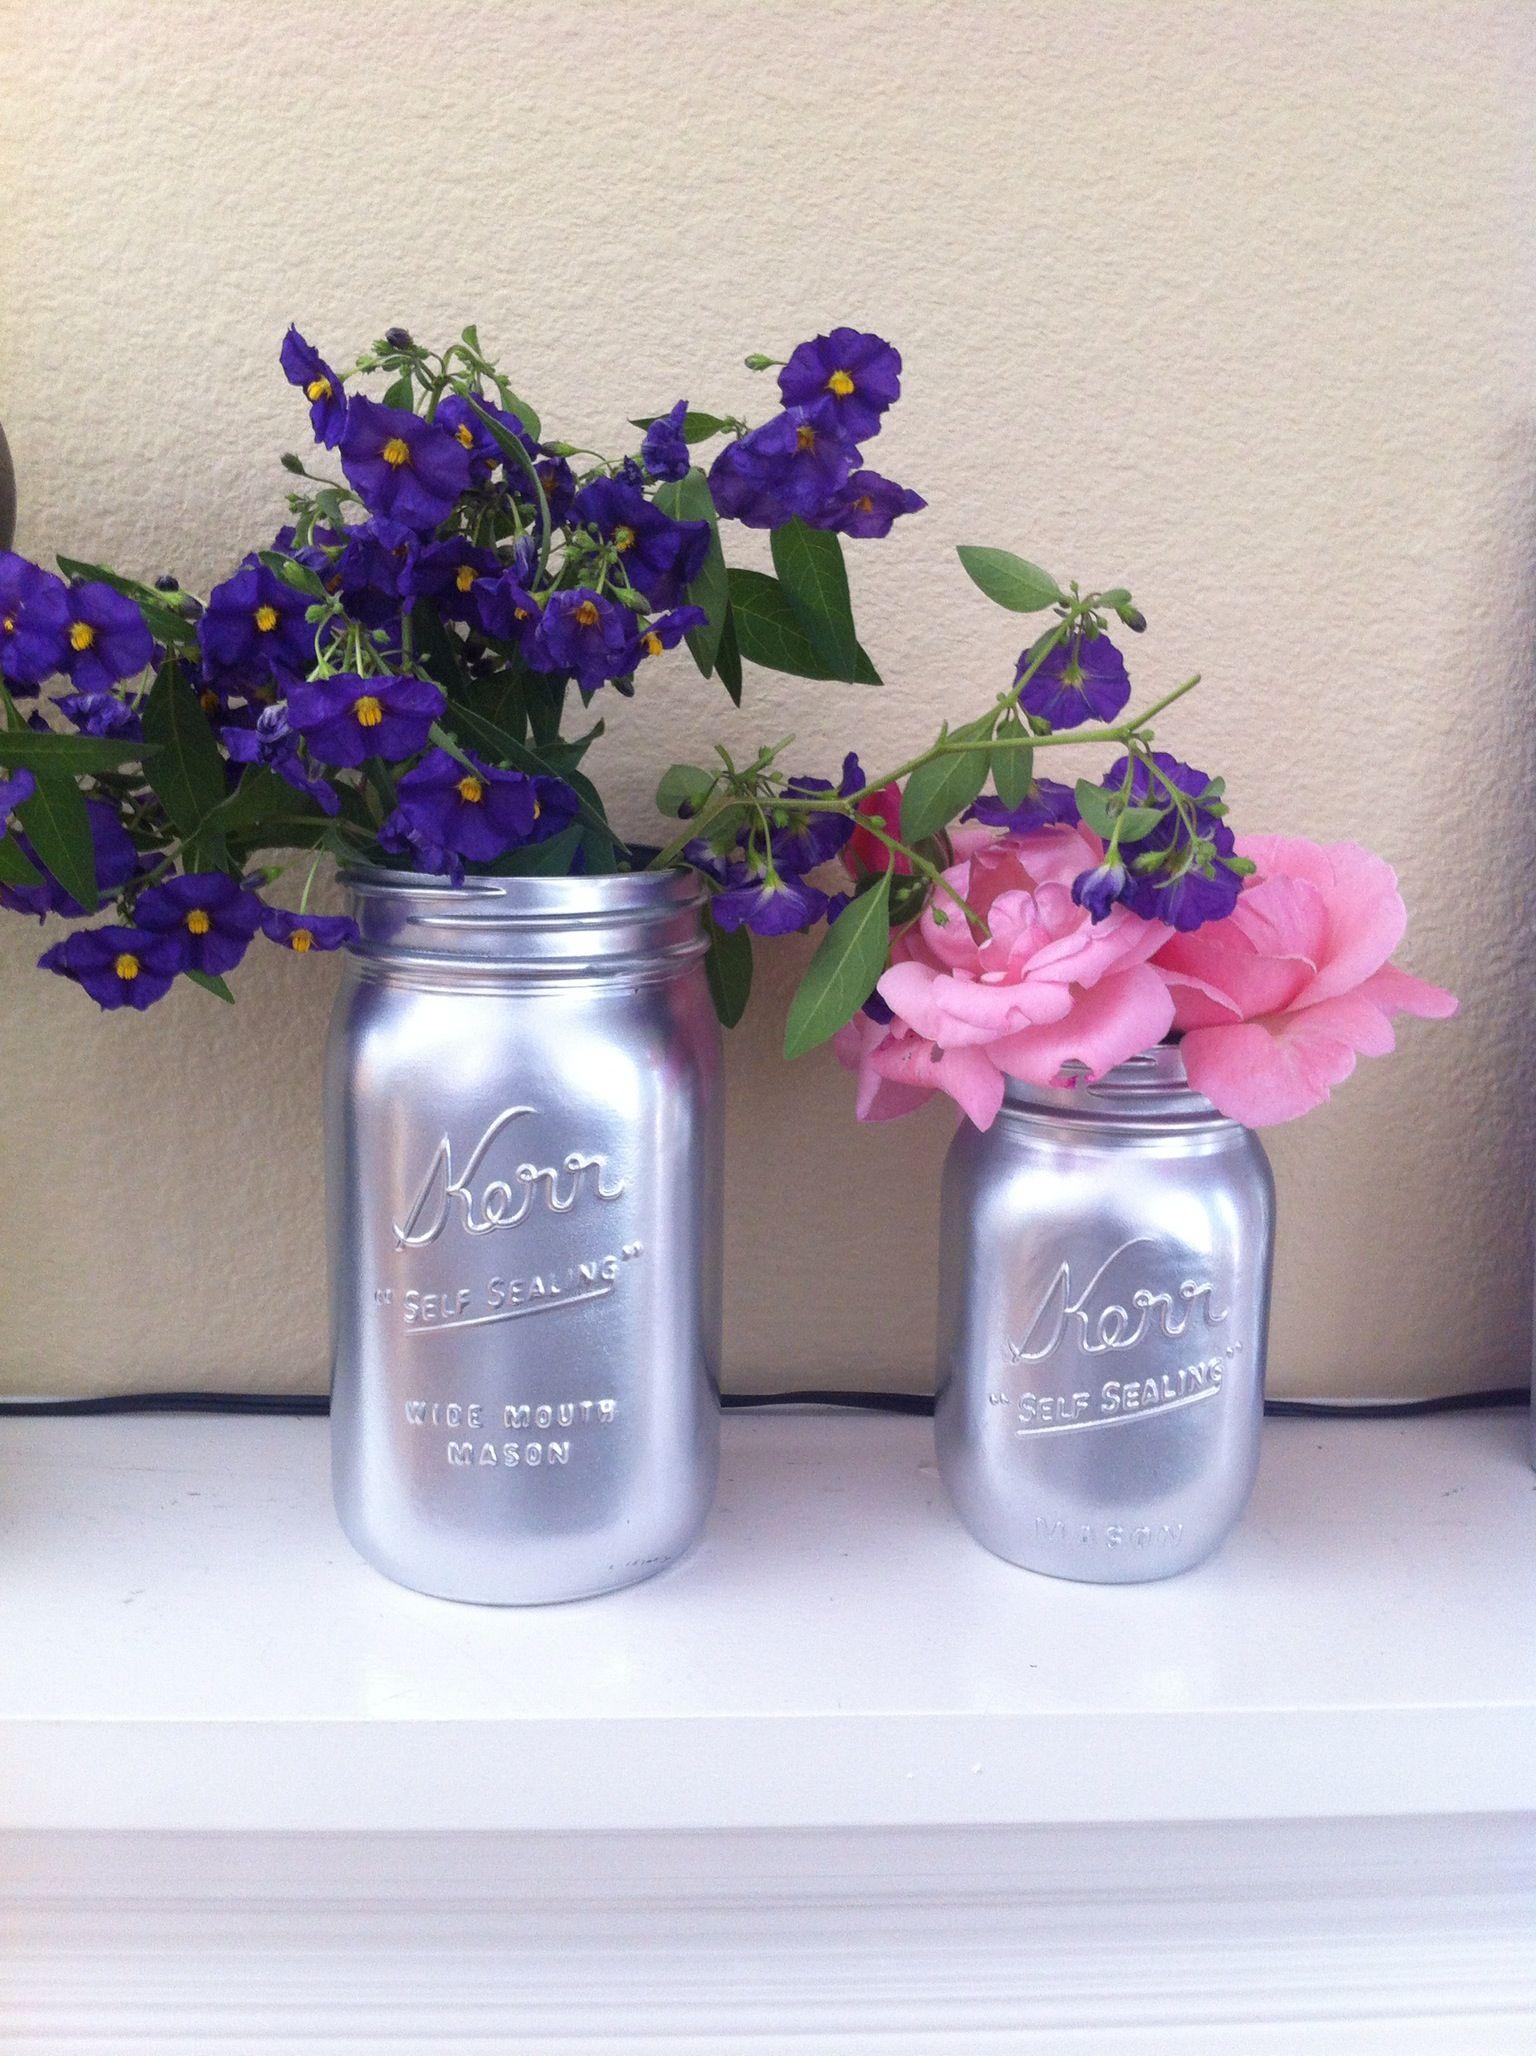 Spray painted mason jars make pretty vases